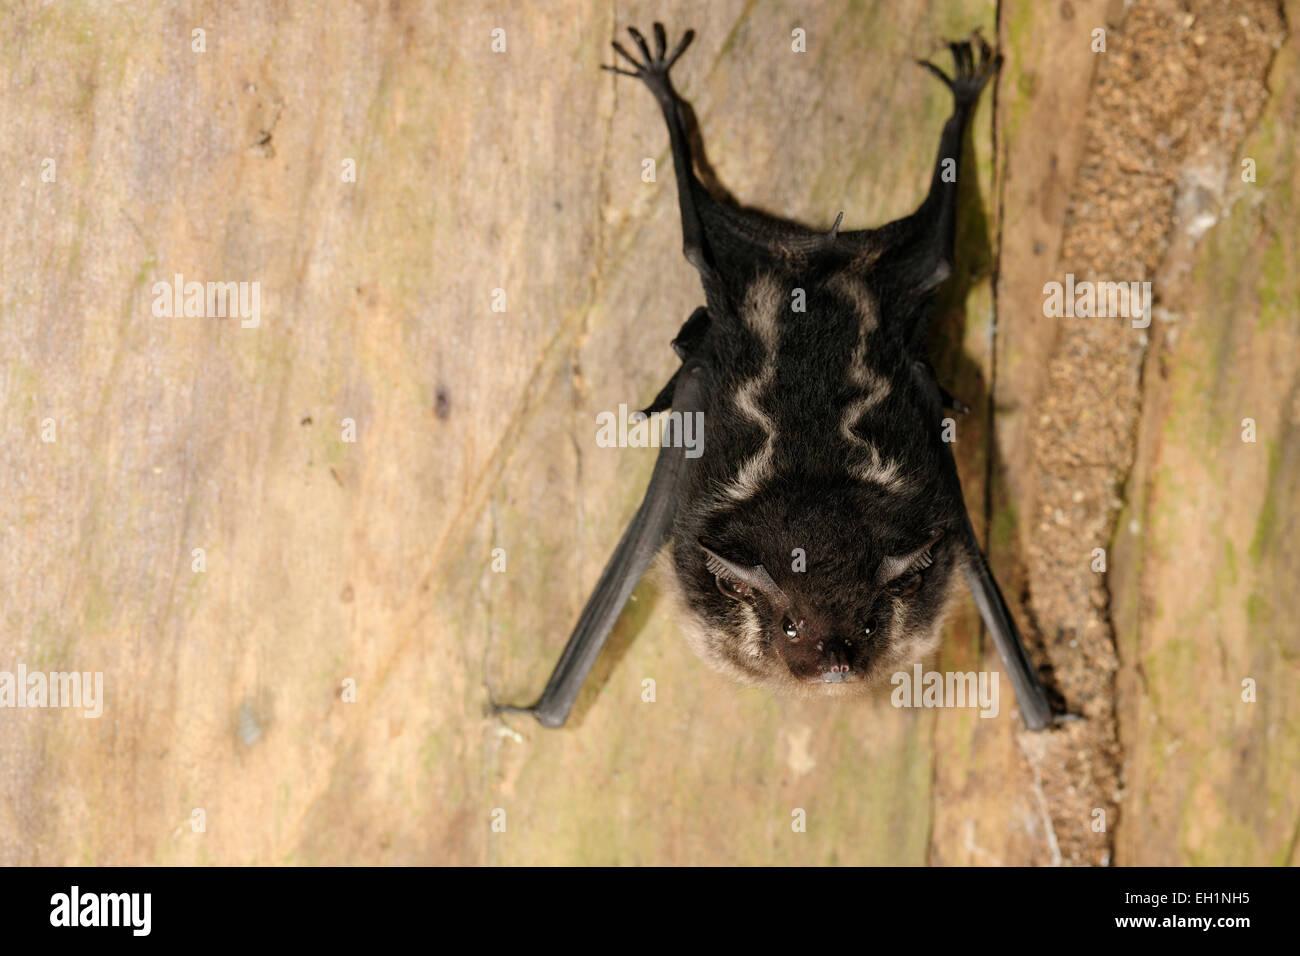 Greater Sac-winged Bat. (Saccopteryx bilineata), La Selva Biological Station, Costa Rica |  Sackflügel- oder - Stock Image